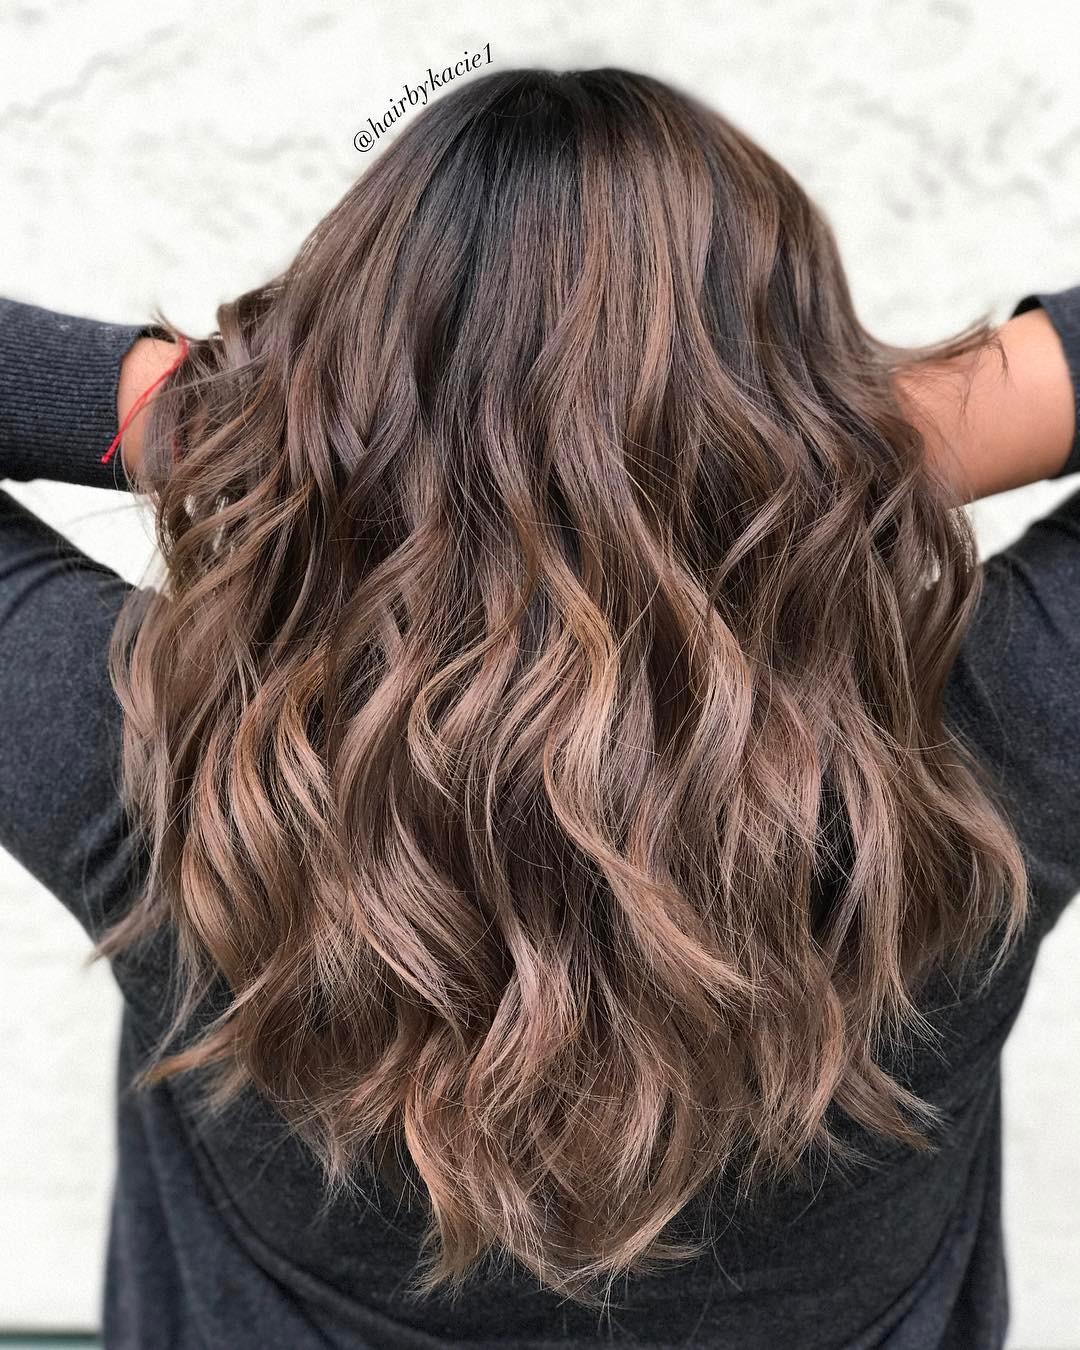 Long Wavy Chocolate Hairstyle